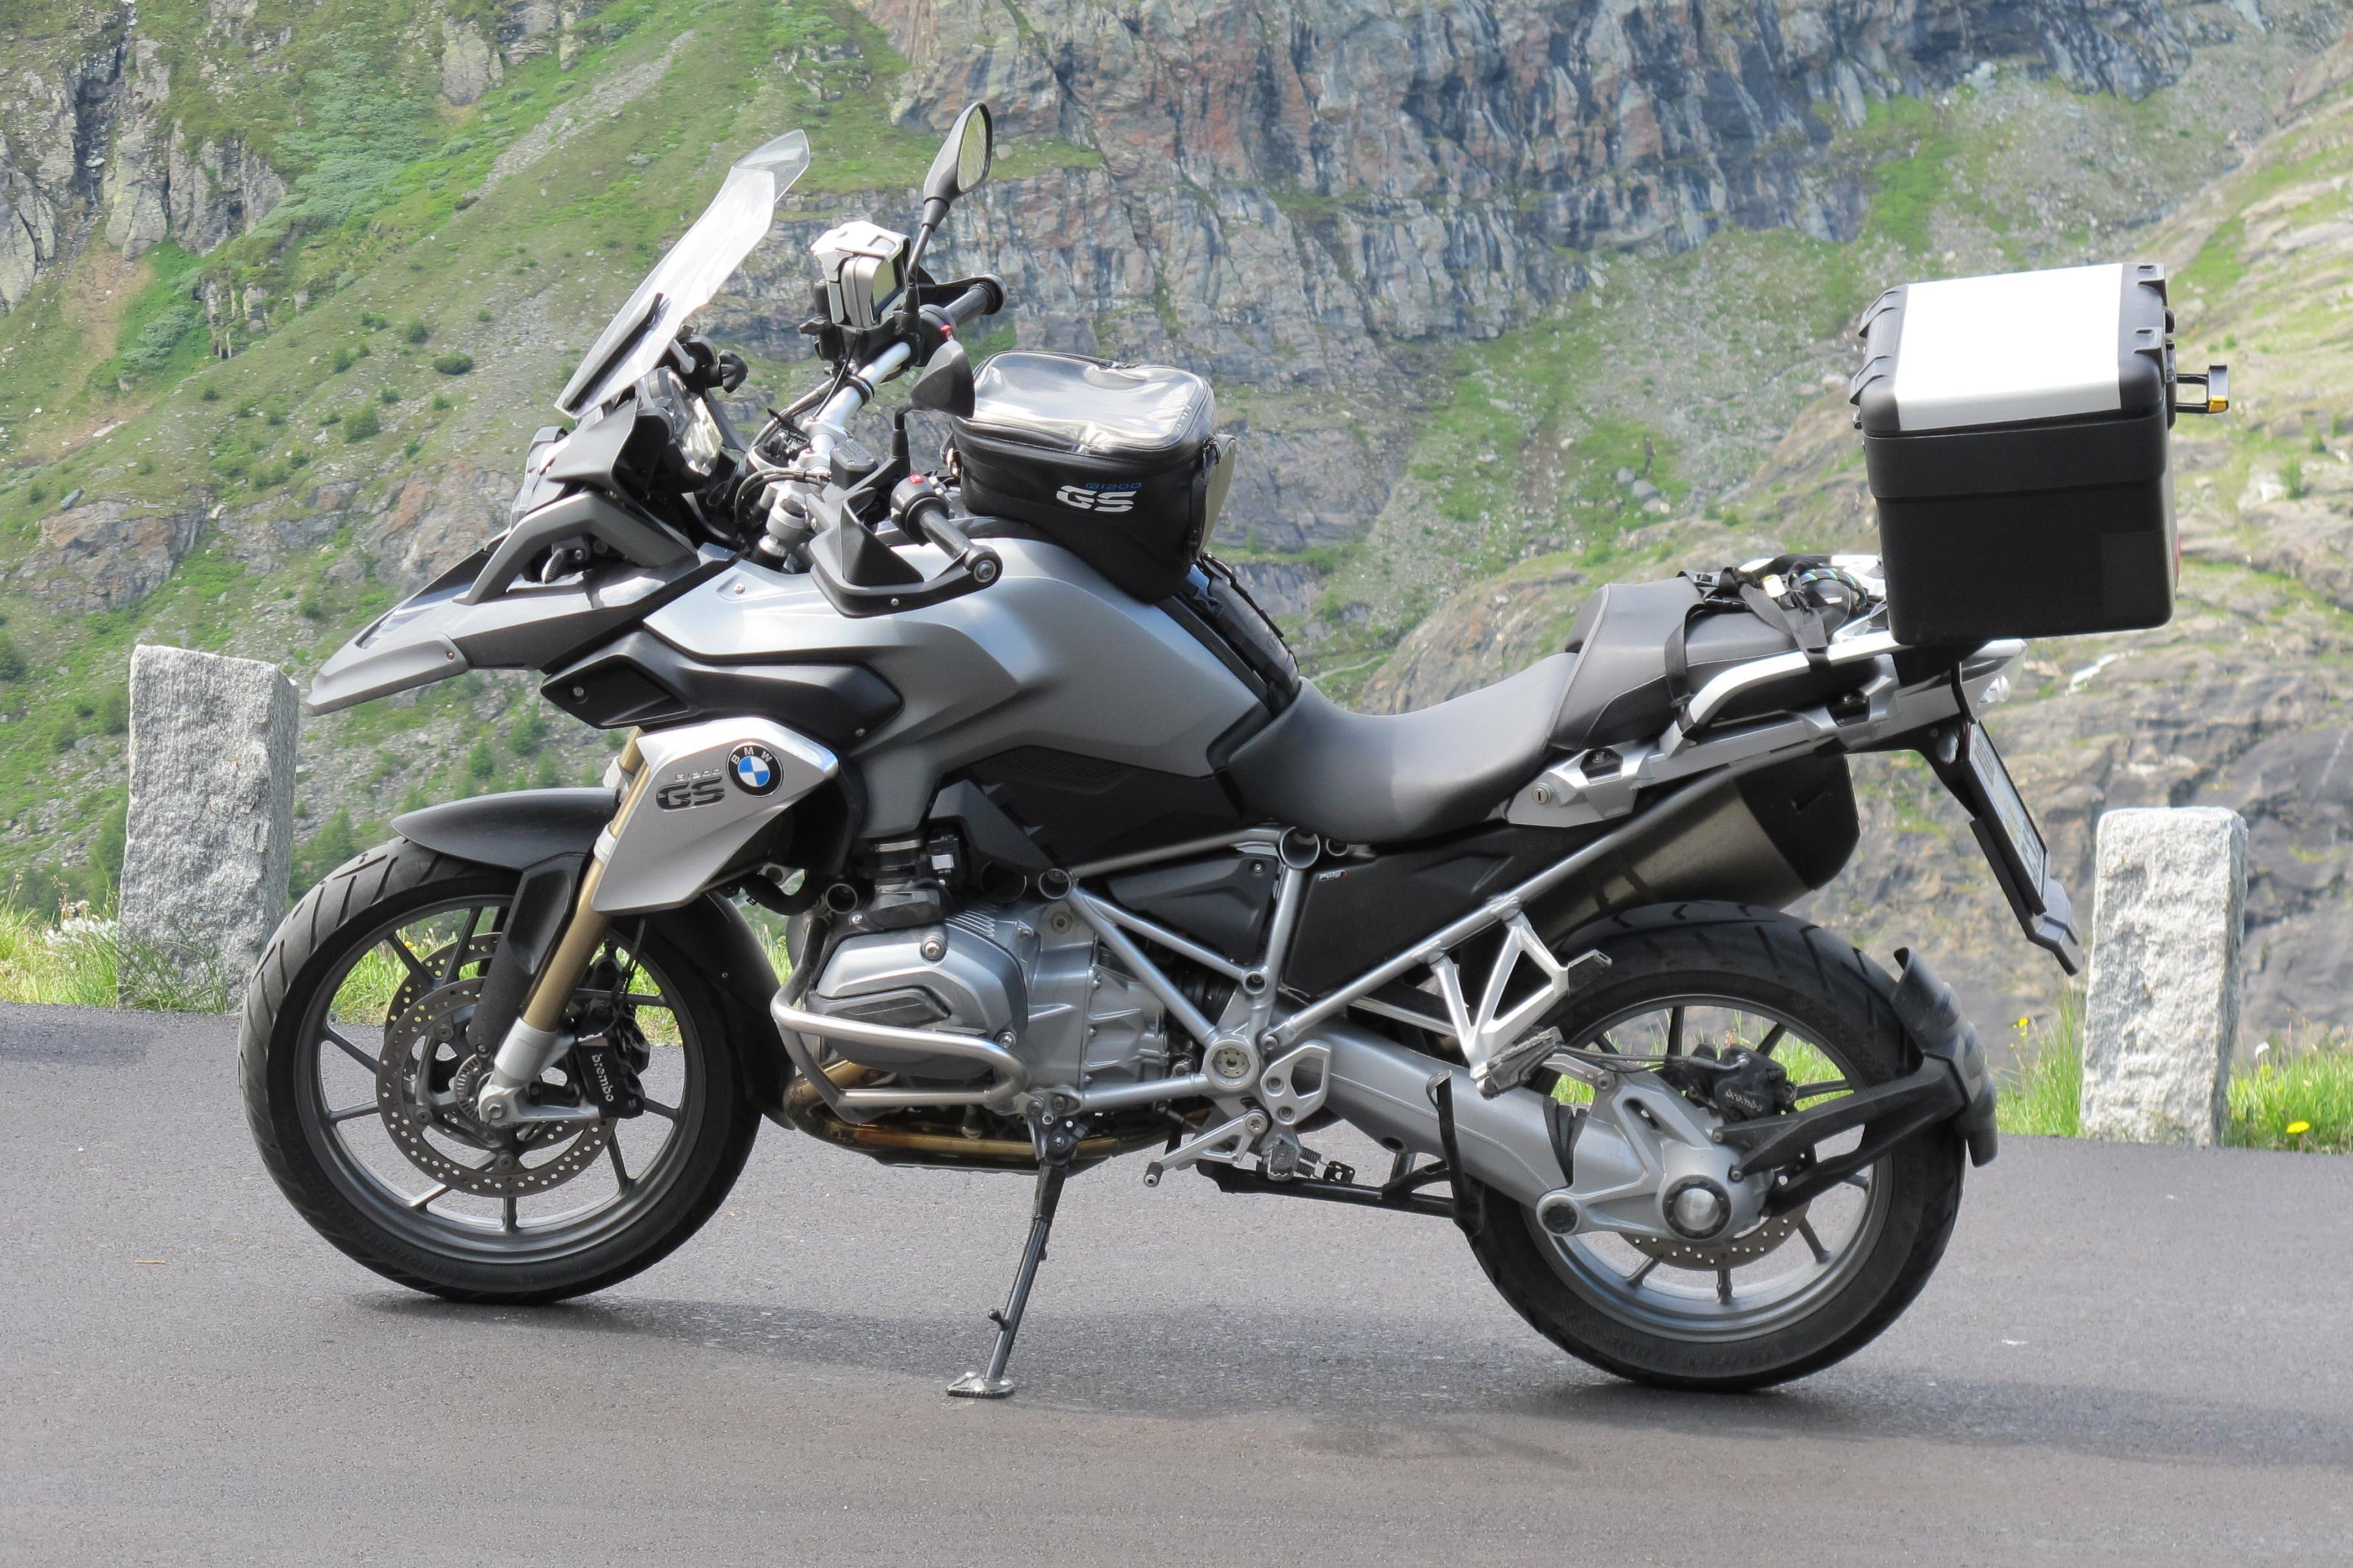 motorradtour-juni-2014-033.jpg